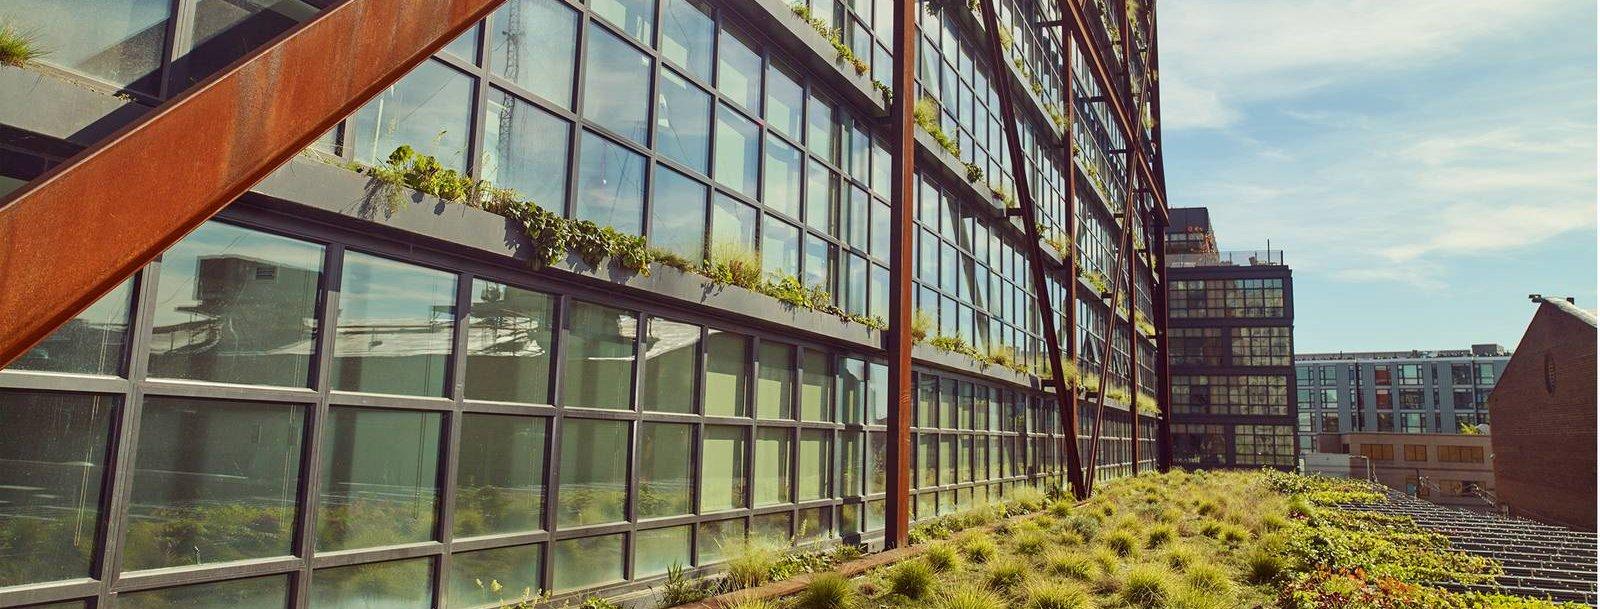 Future Green Atlantic Plumbing Residences